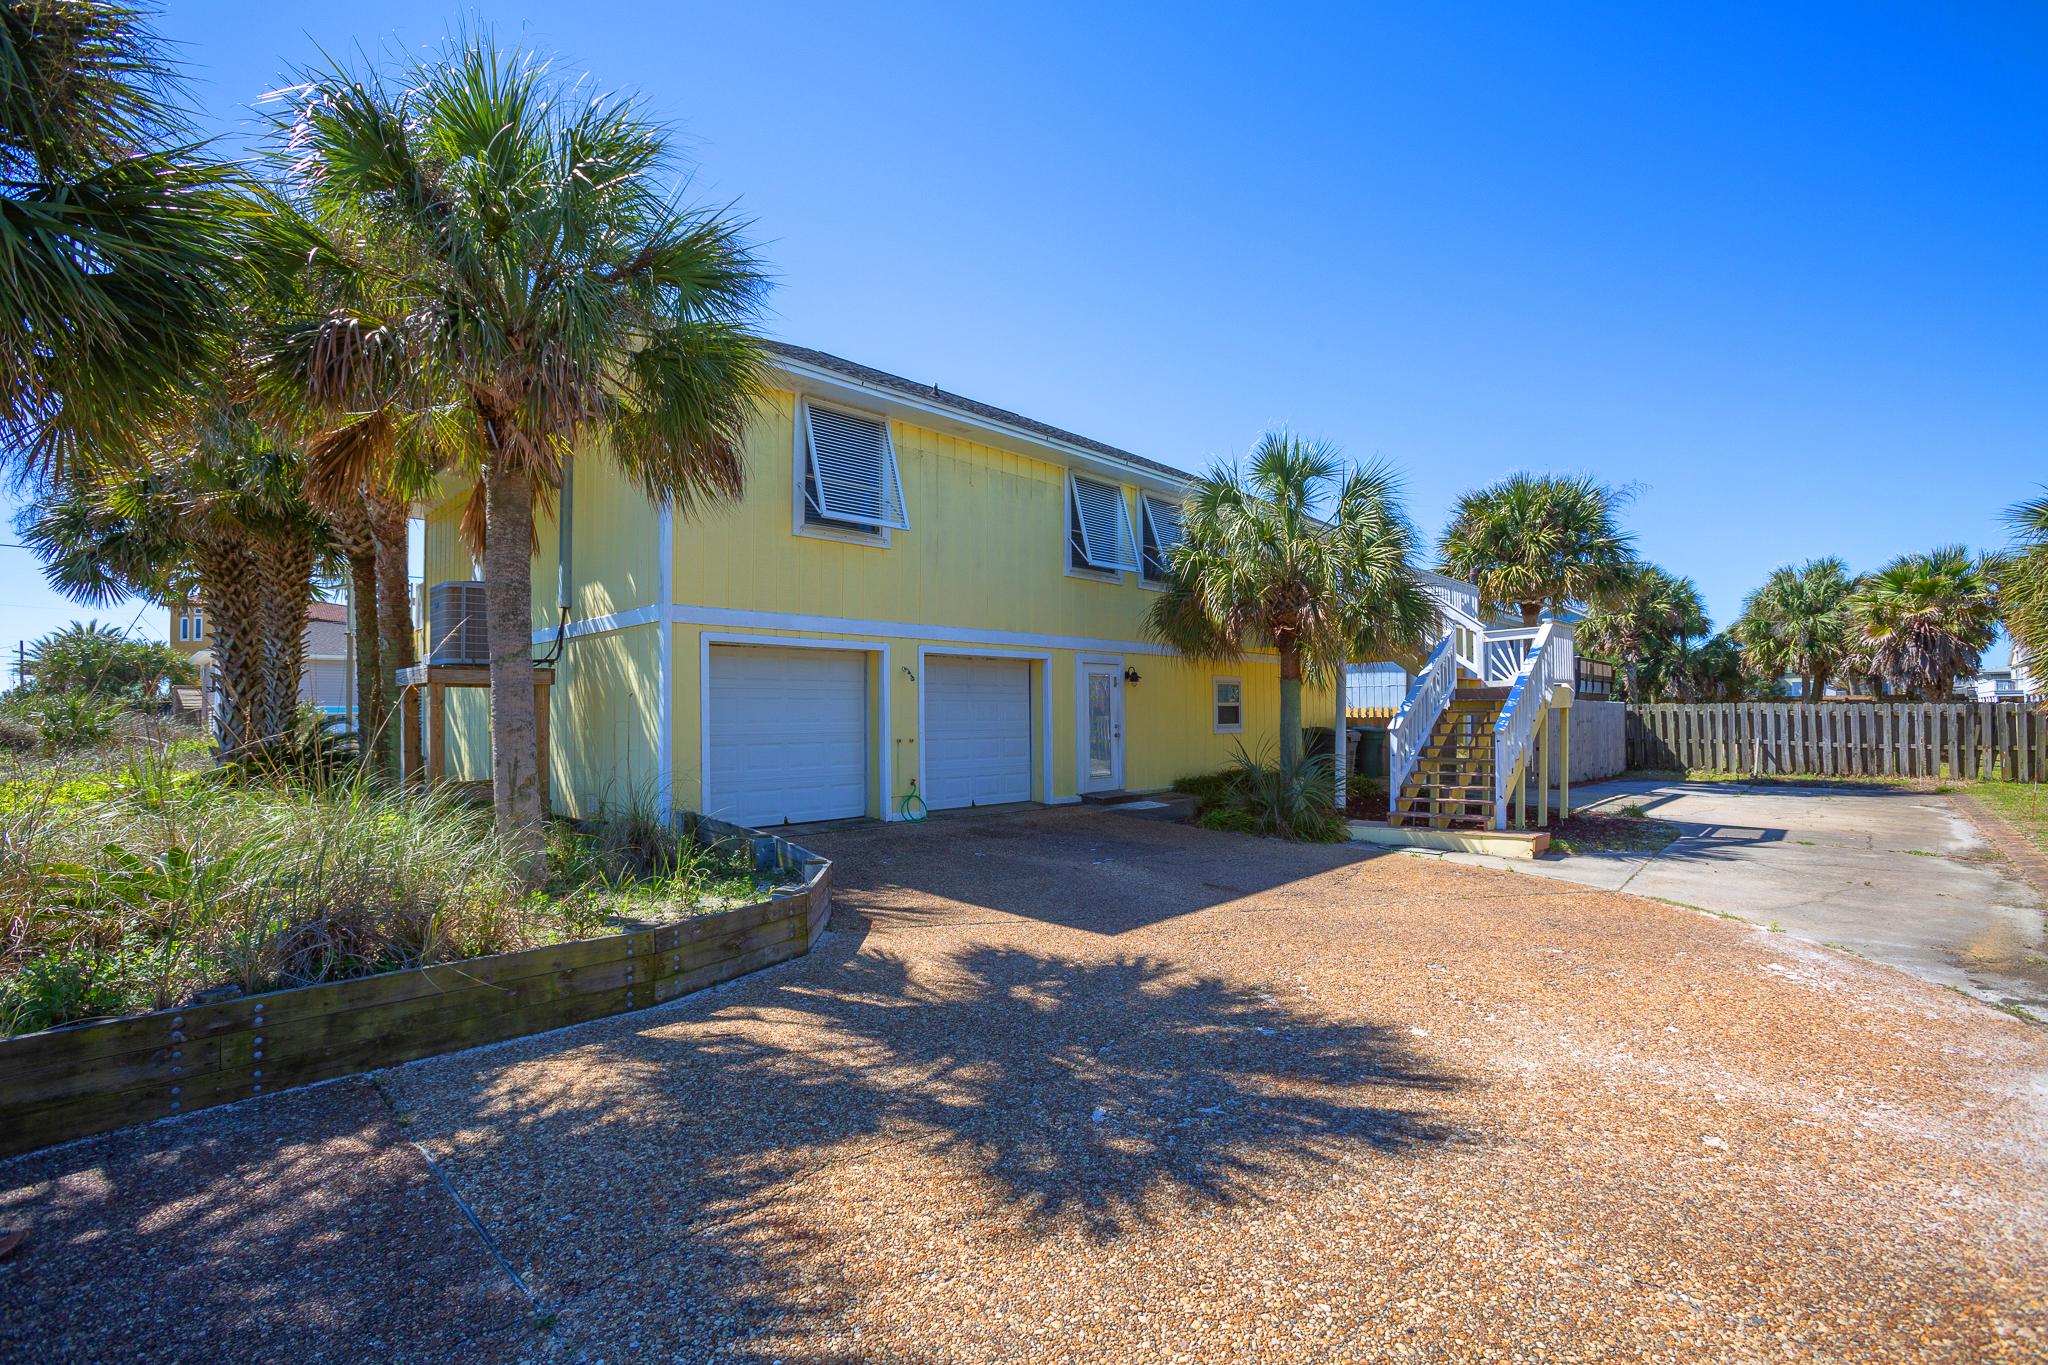 Maldonado 1015 - Sea the Big Picture House/Cottage rental in Pensacola Beach House Rentals in Pensacola Beach Florida - #2